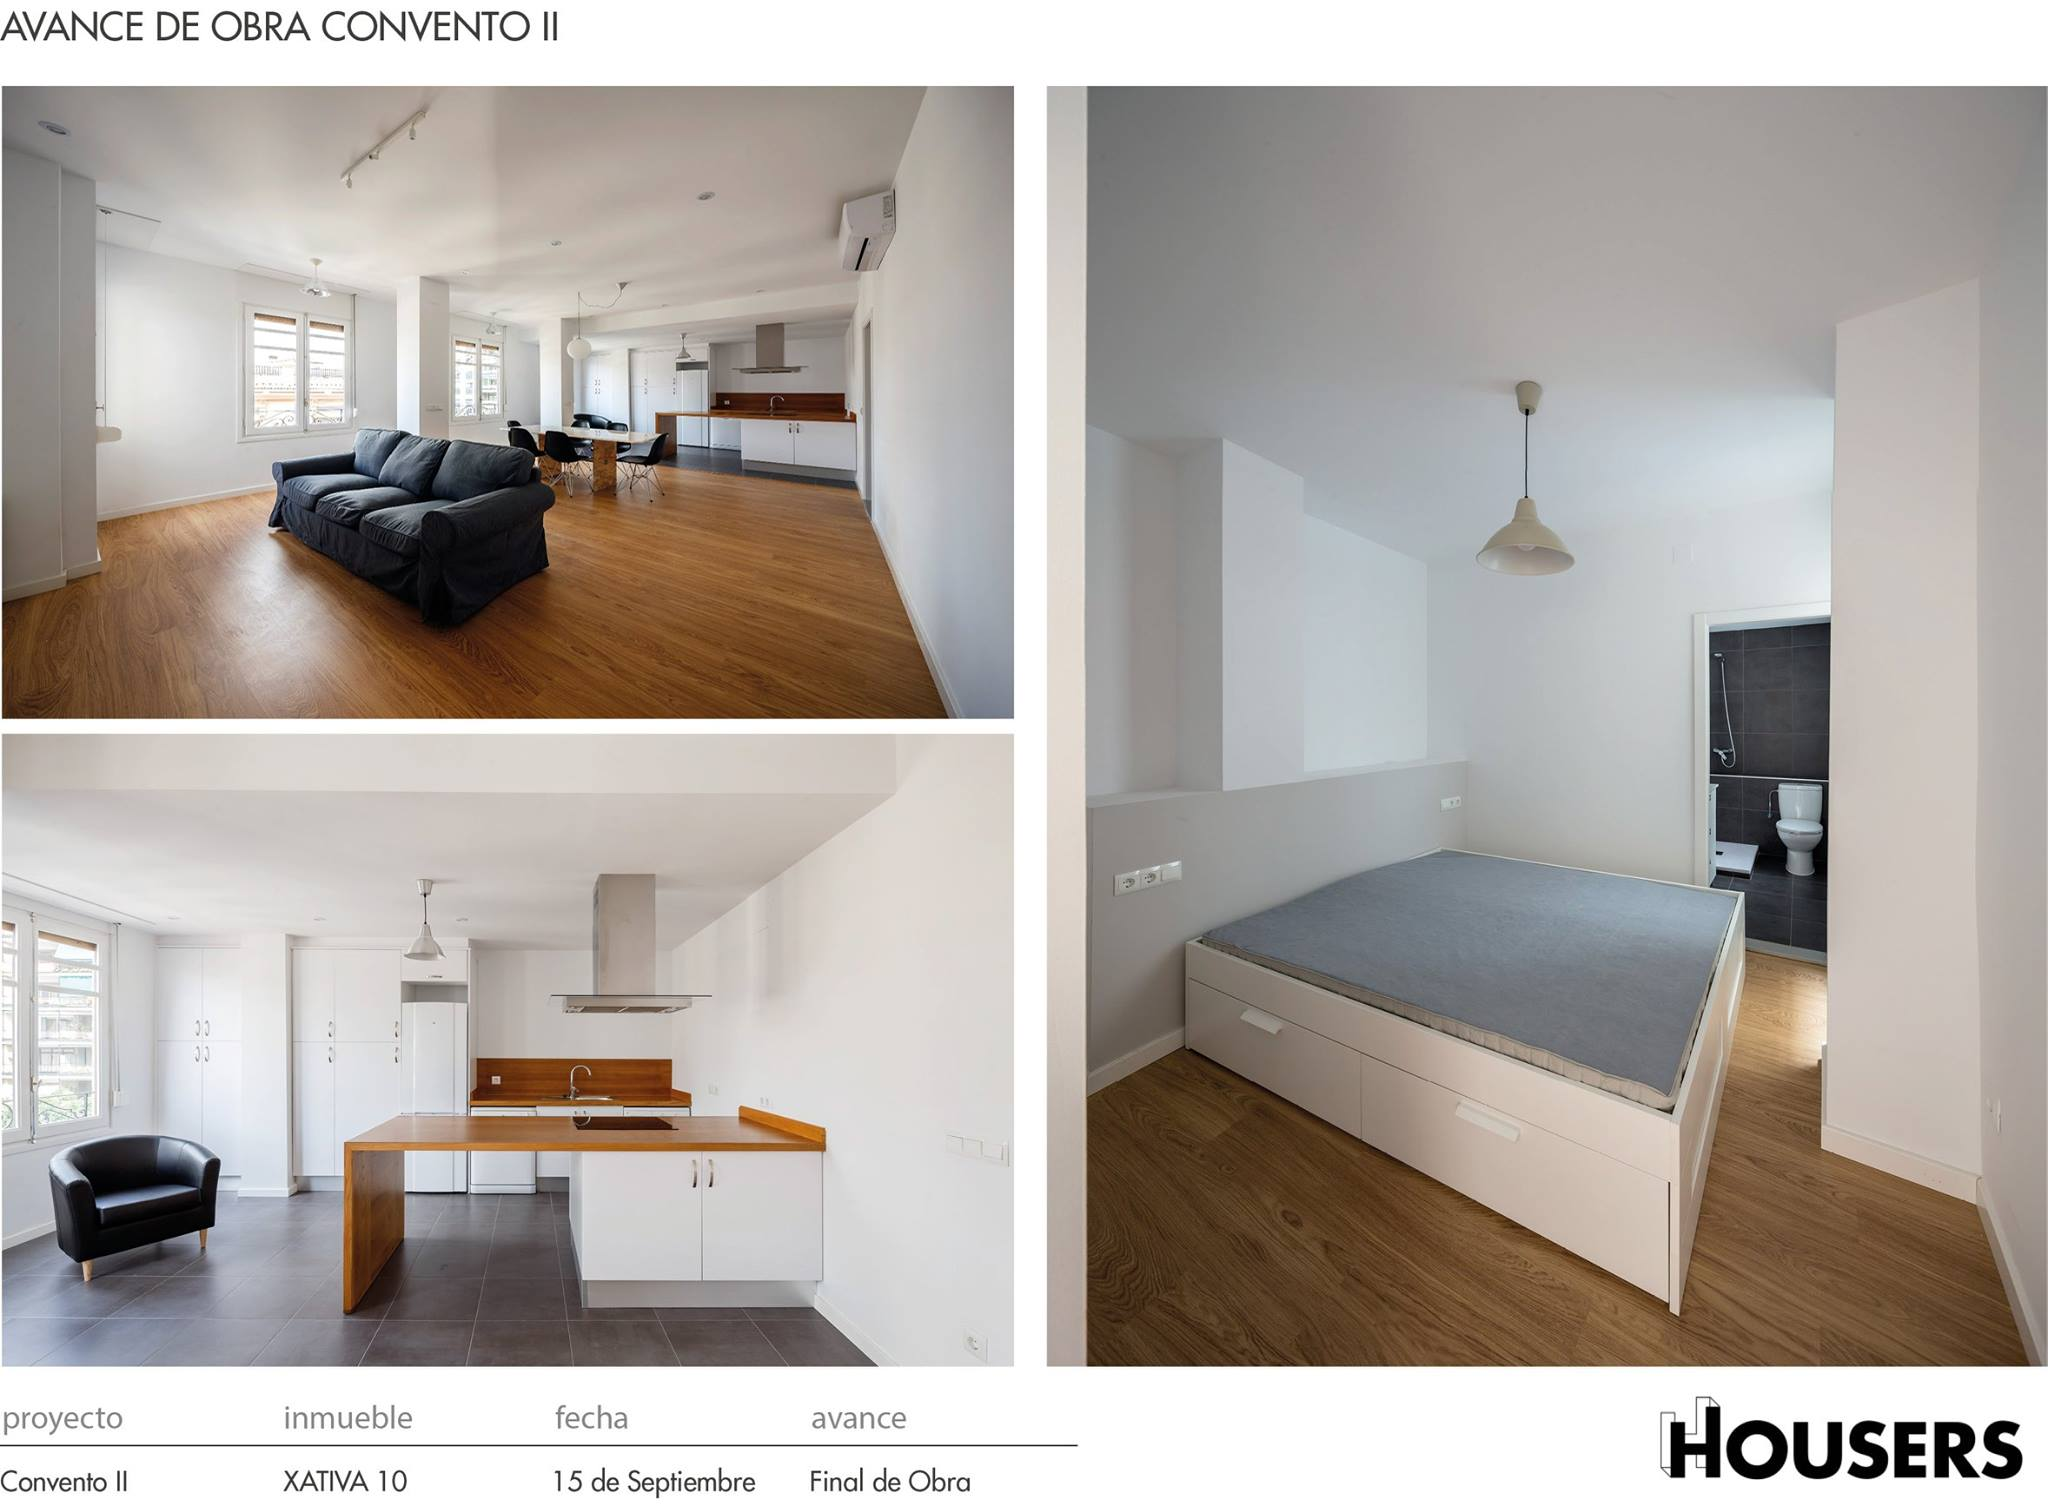 housers-crowdfunding-avances-obra-2